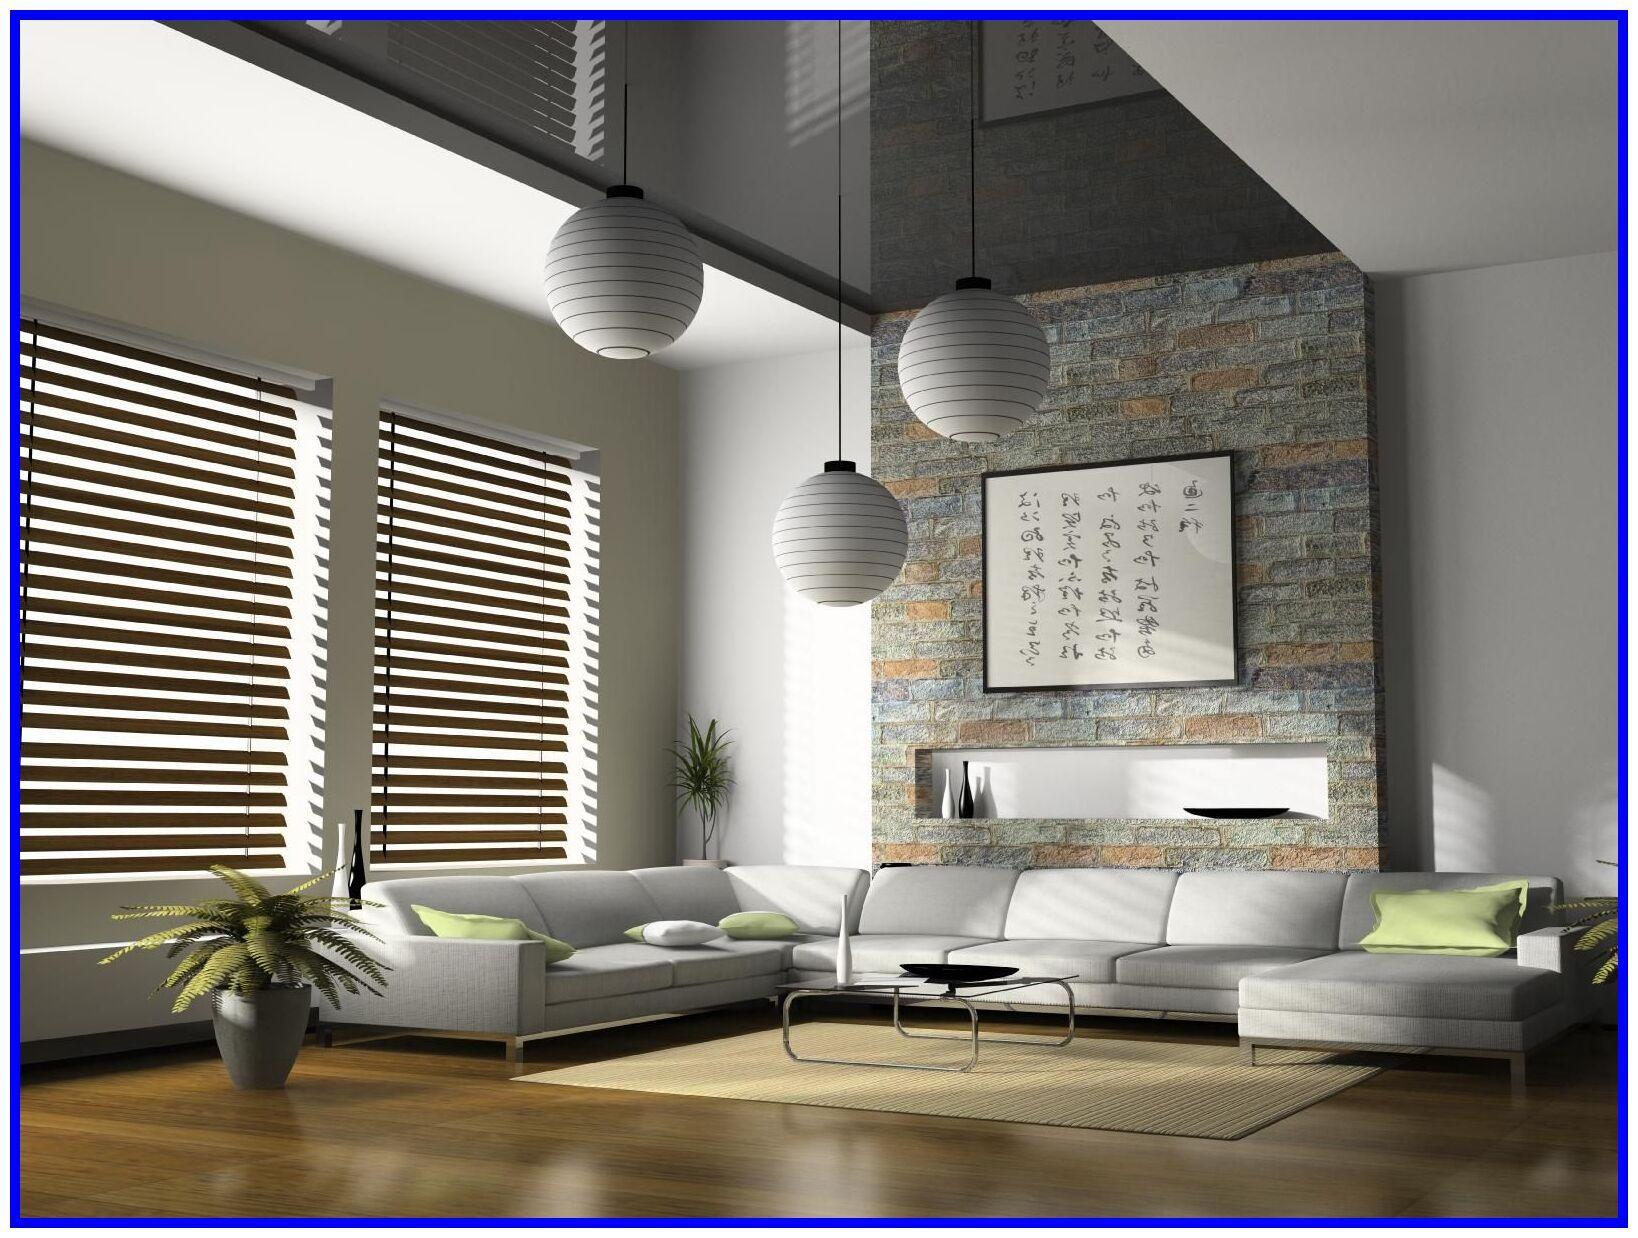 51 Reference Of Roller Blind Living Room Living Room Blinds Roller Blinds Living Room Dining Room Console